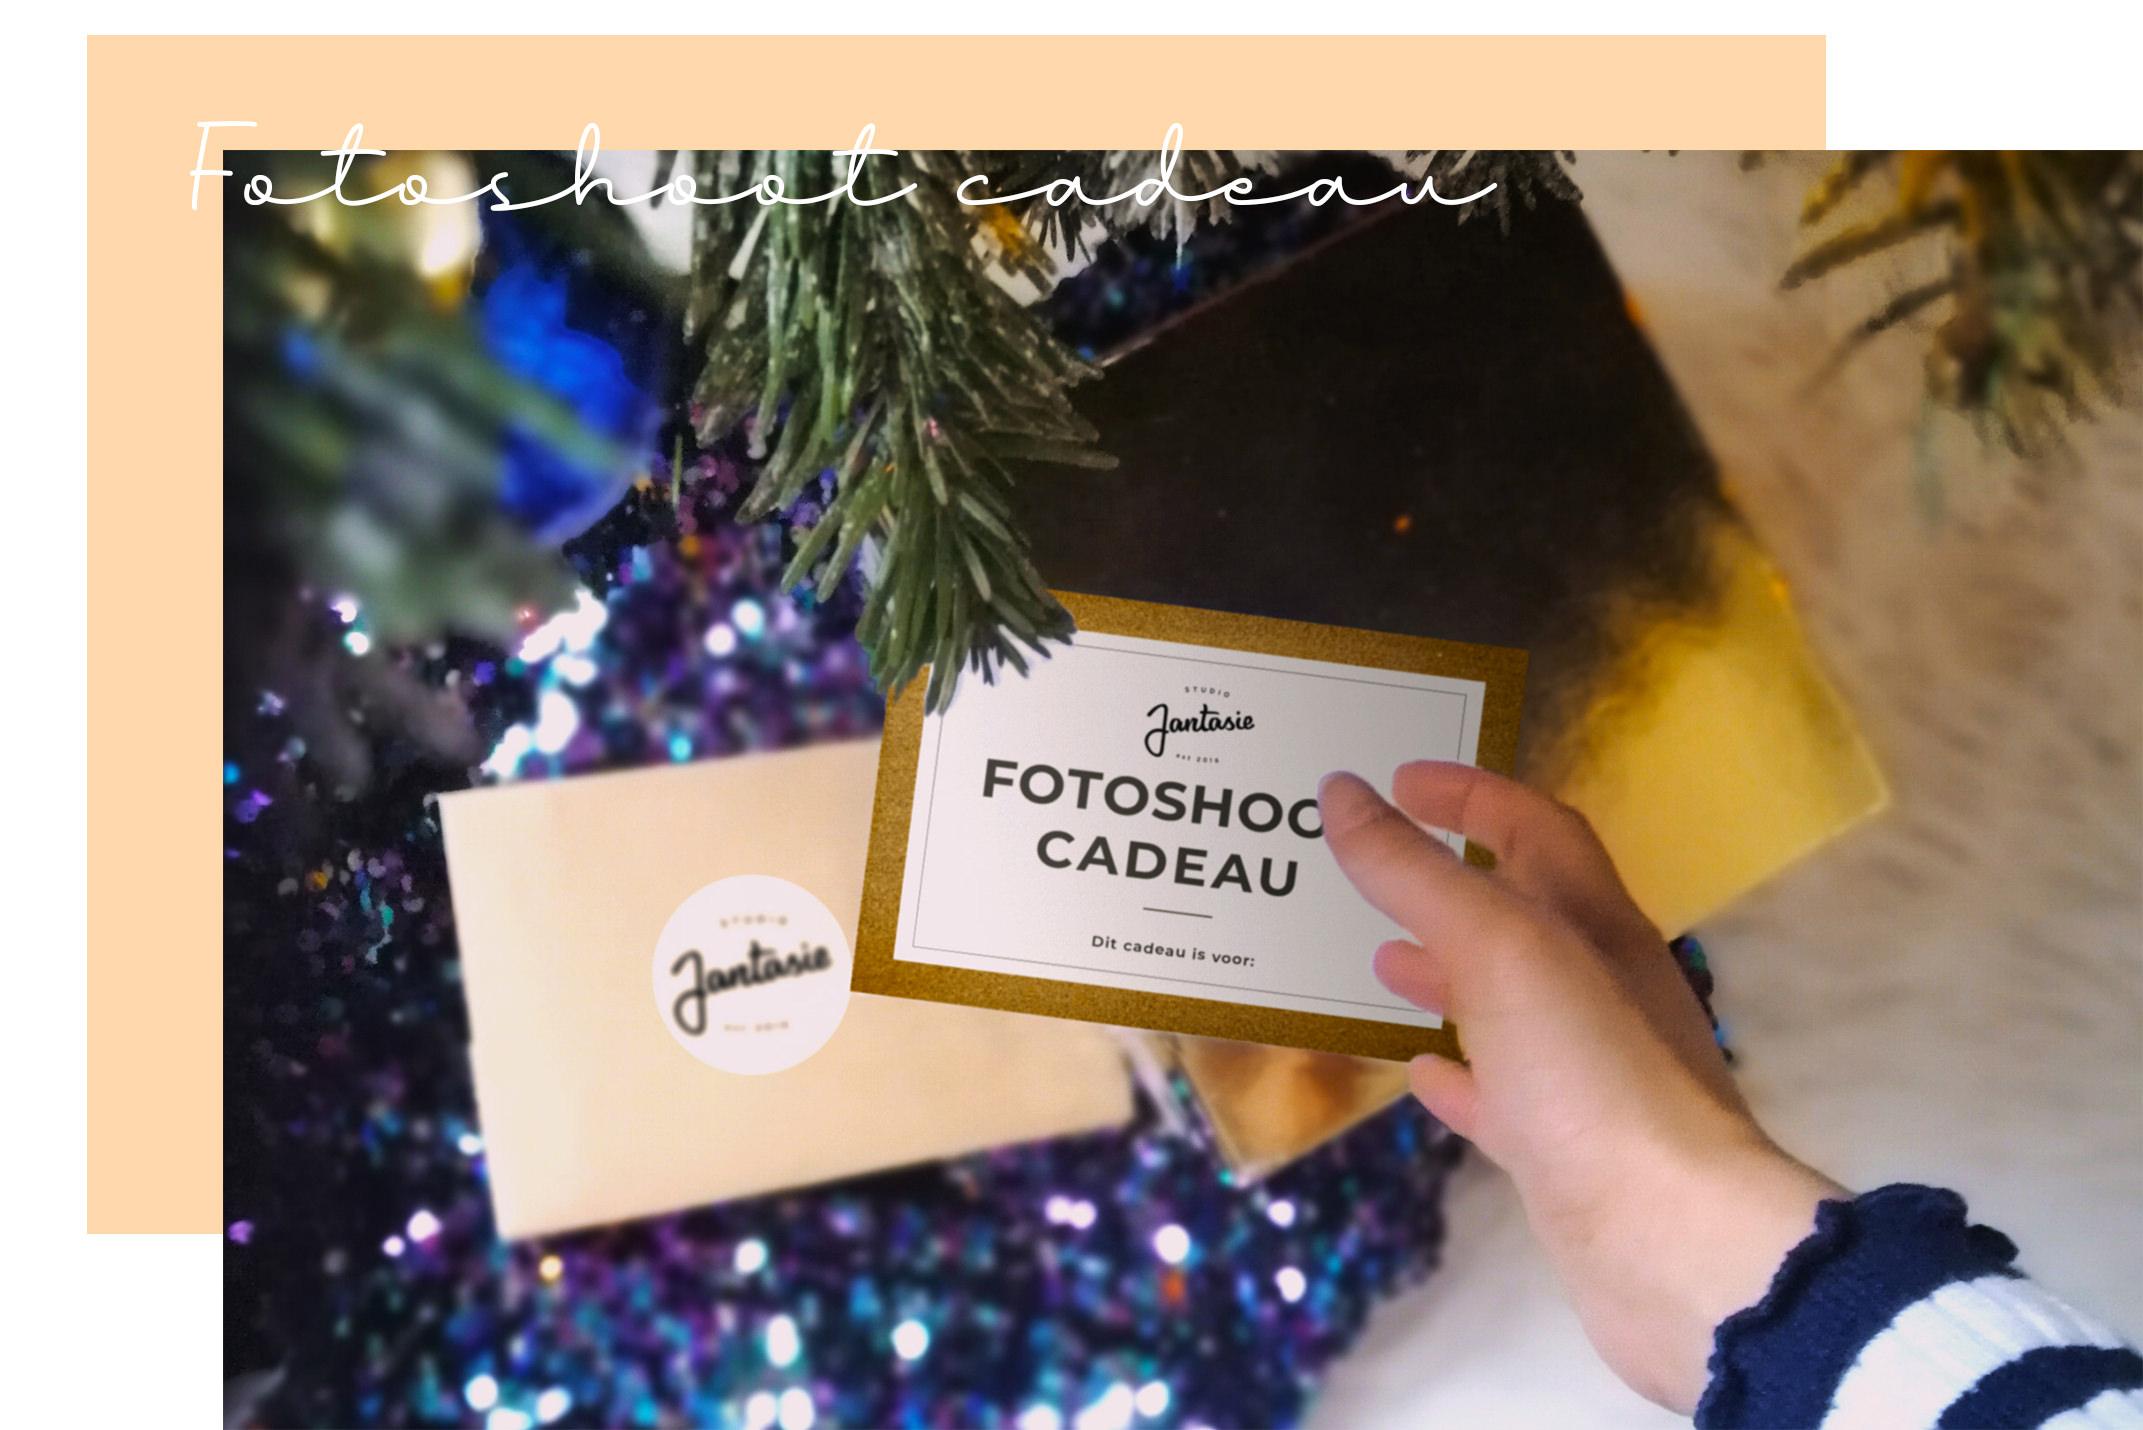 Fotoshoot cadeau